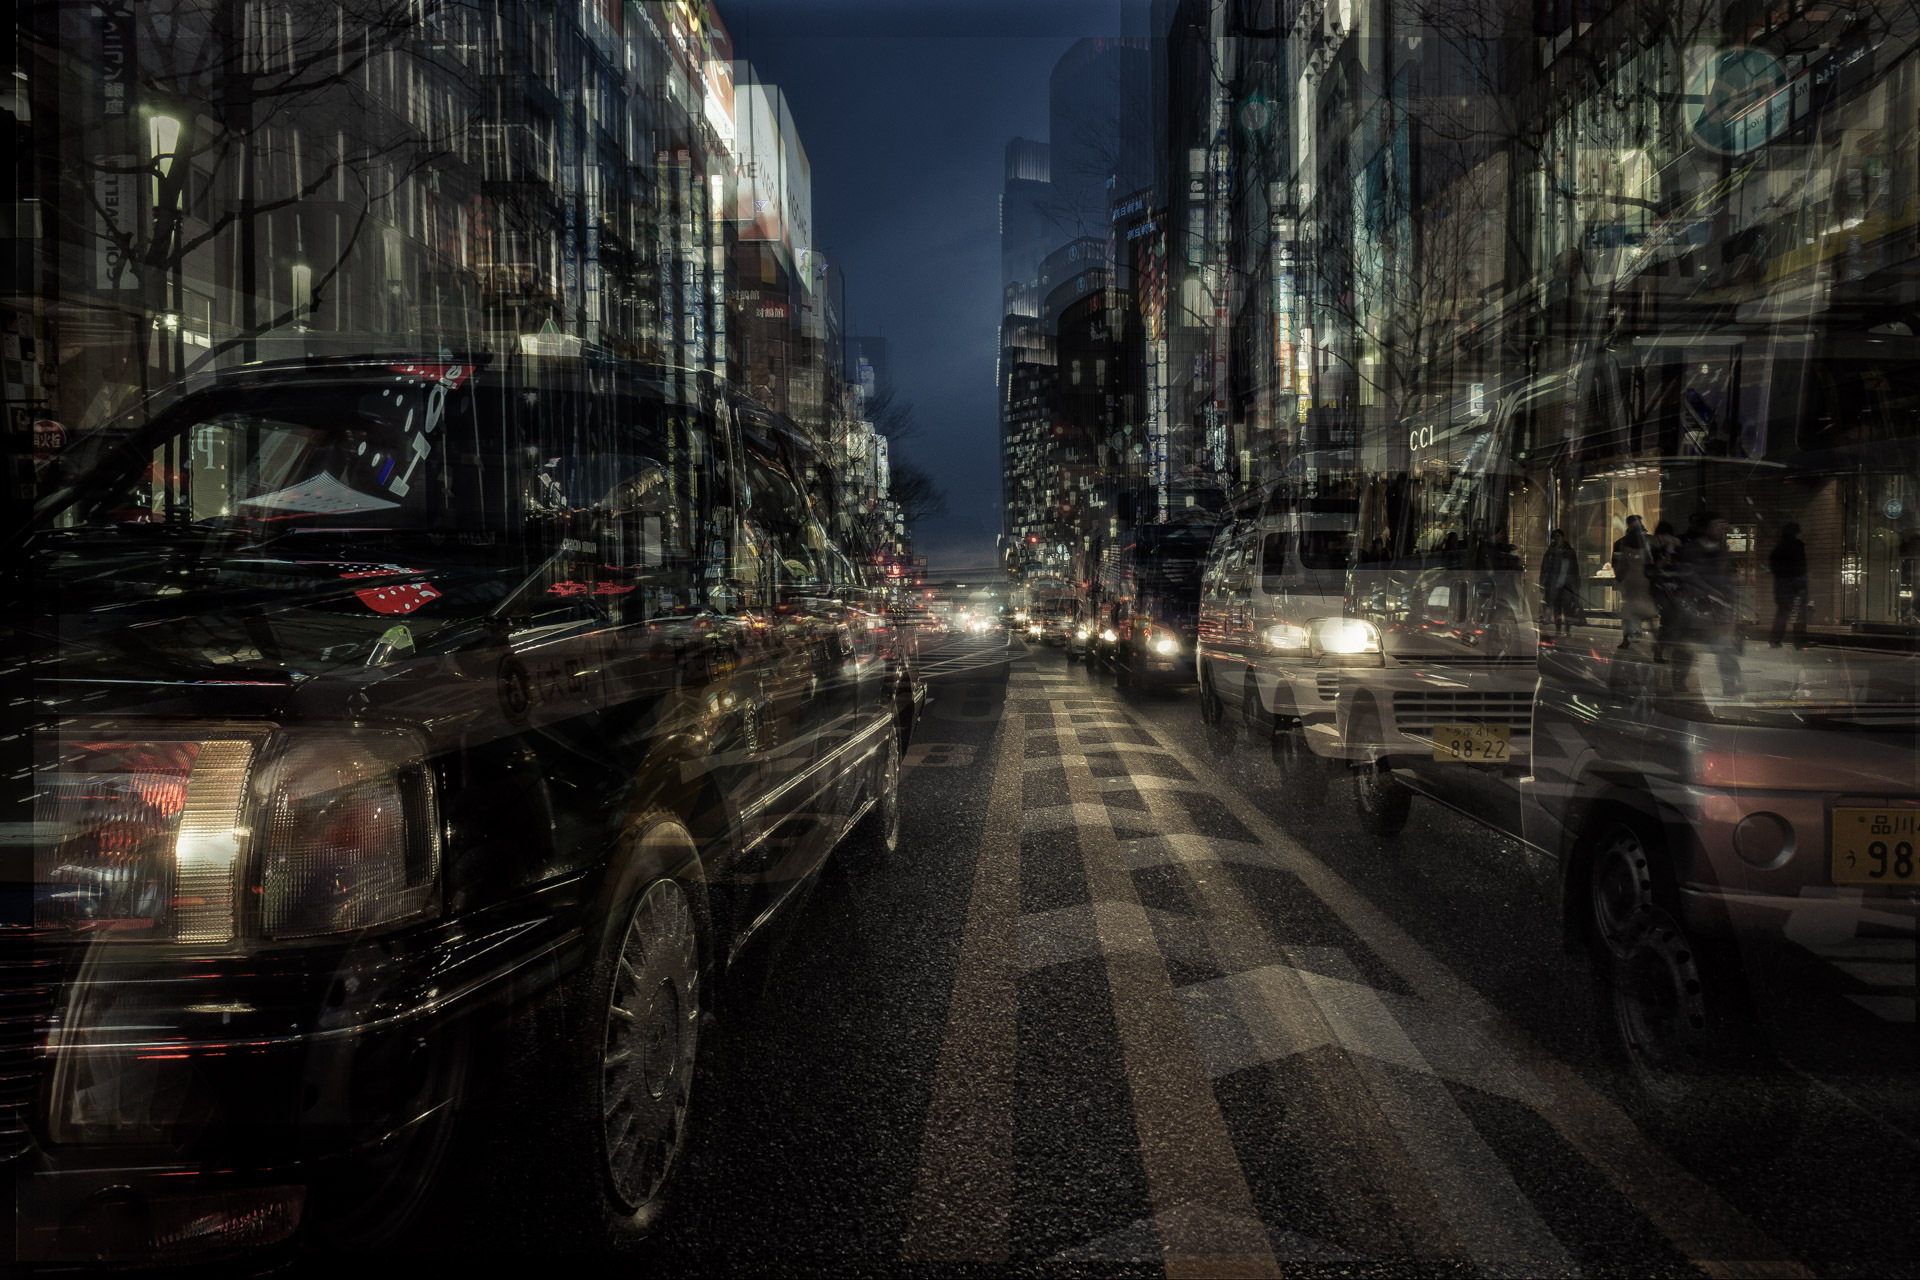 Tokyo series-Riccardo Magherini Fine Art